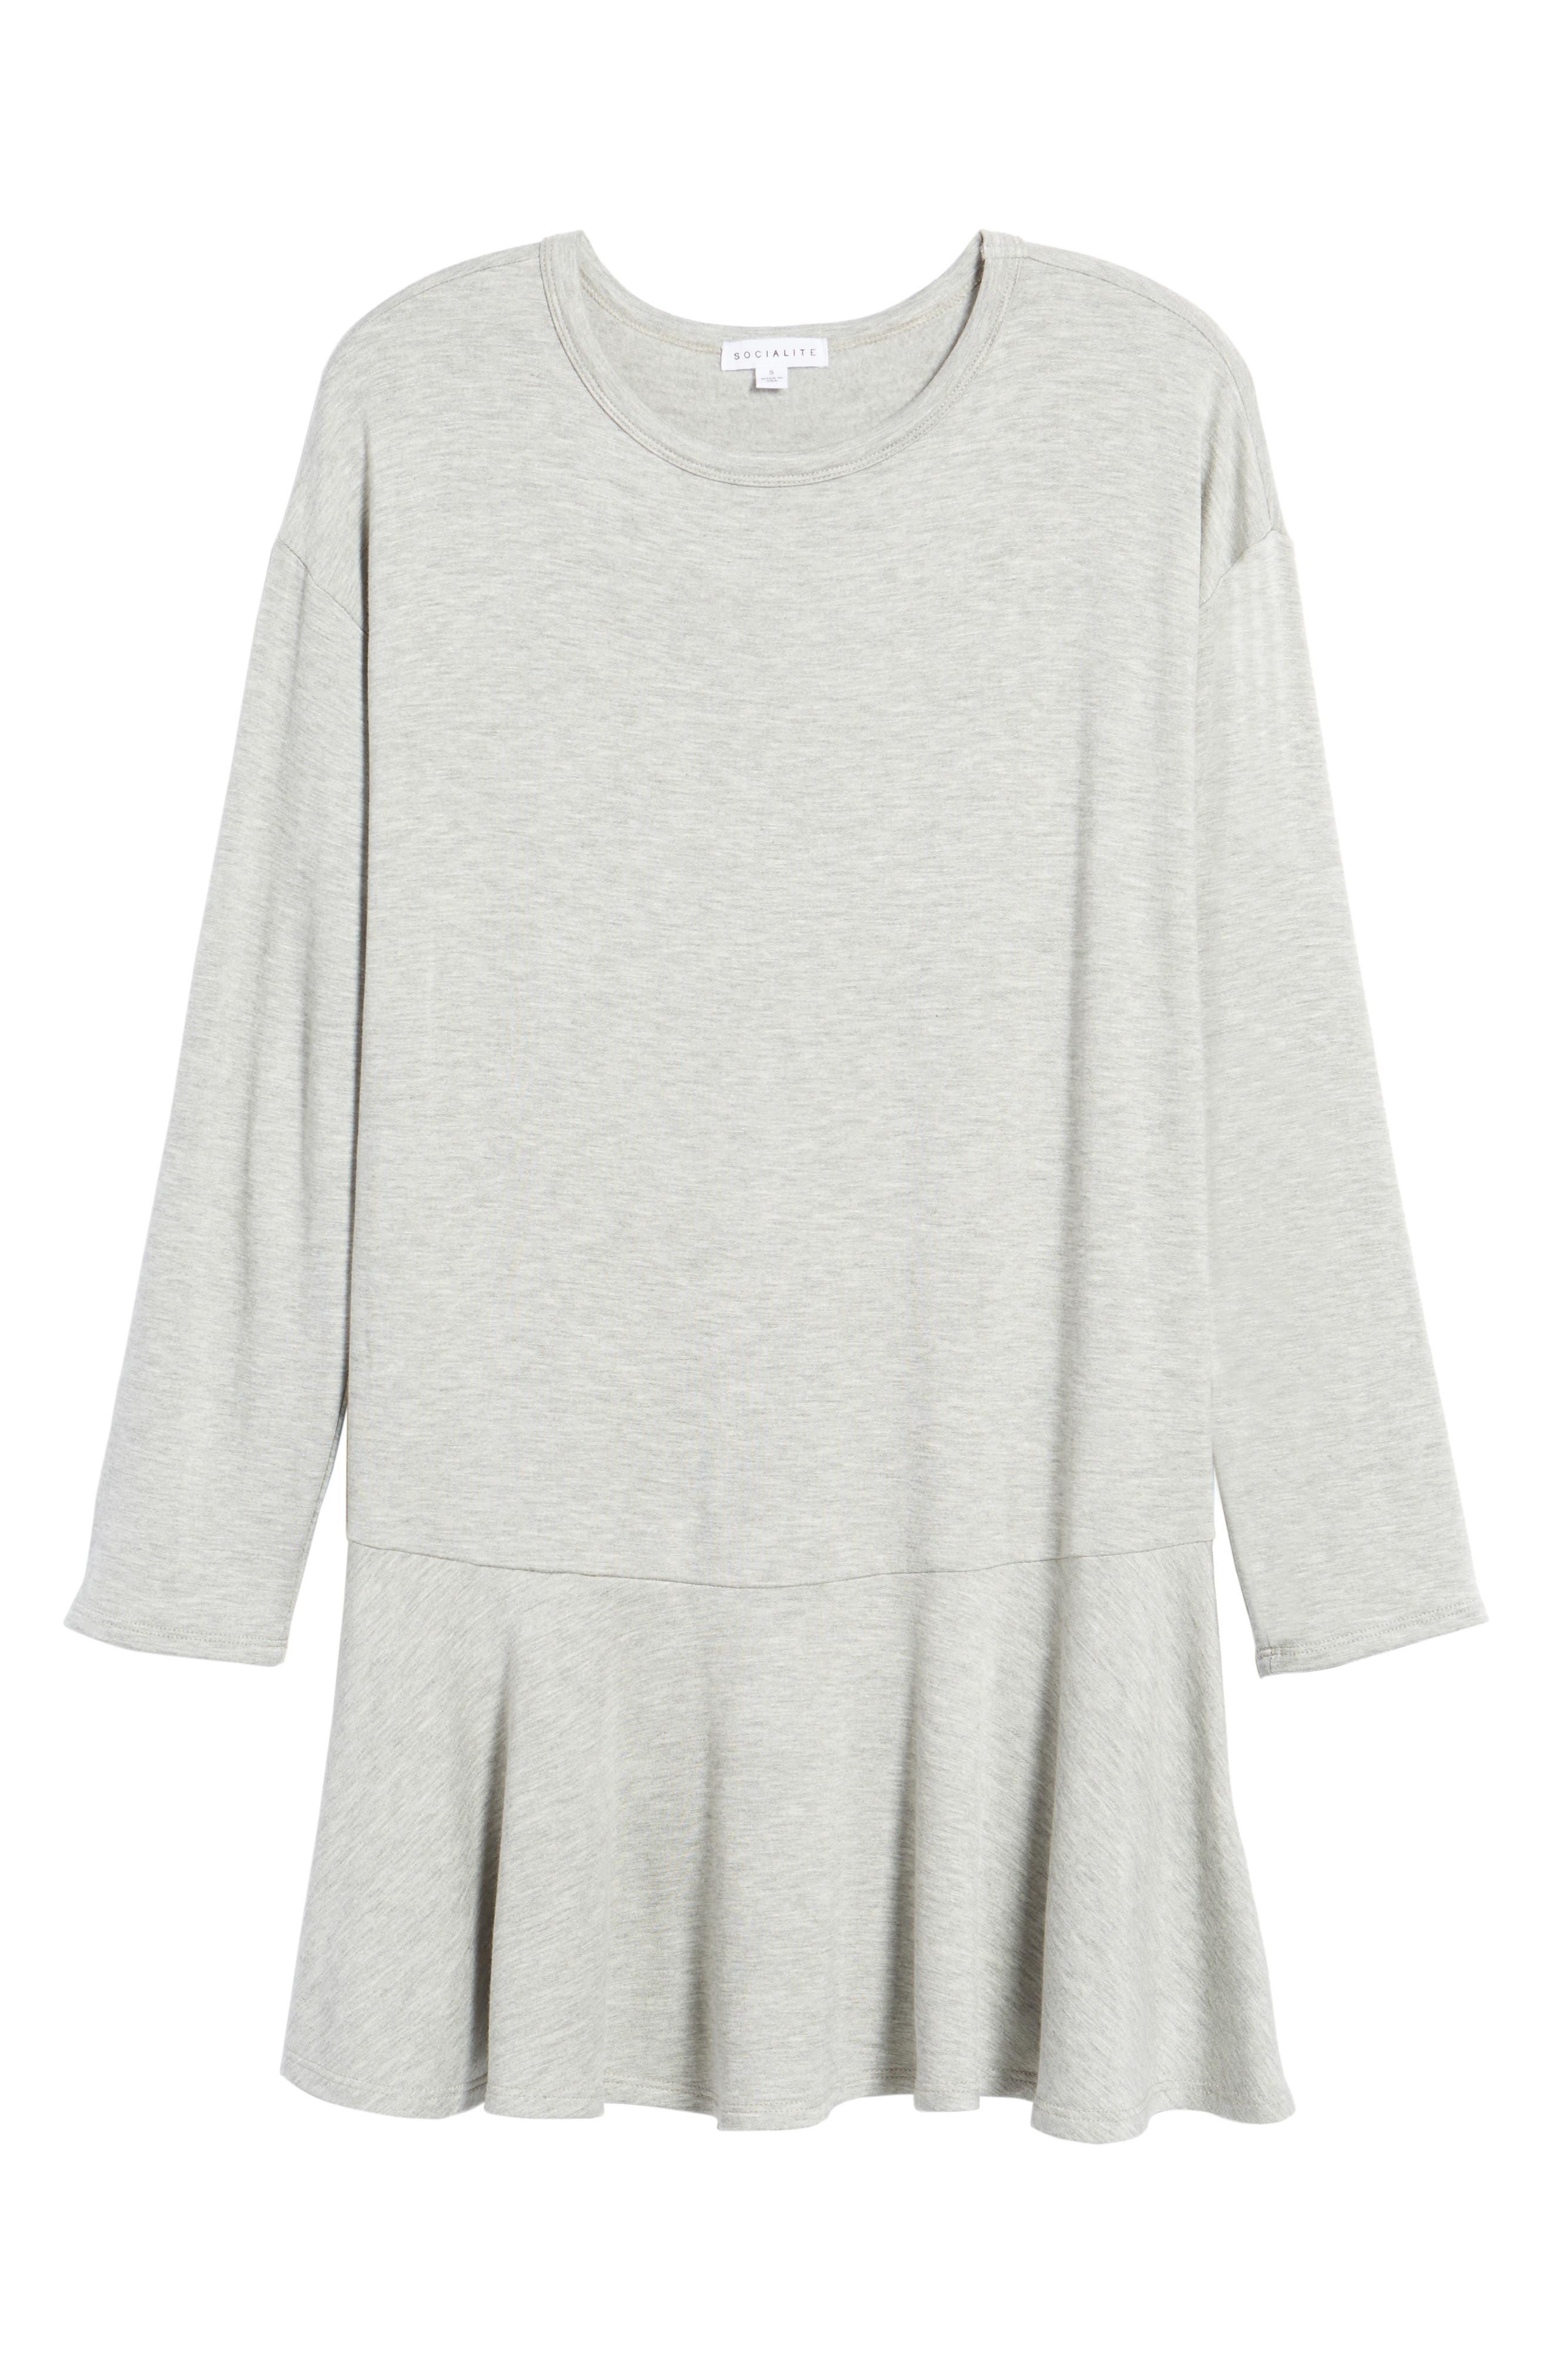 Drop Waist Sweatshirt Dress,                             Alternate thumbnail 6, color,                             Heather Grey